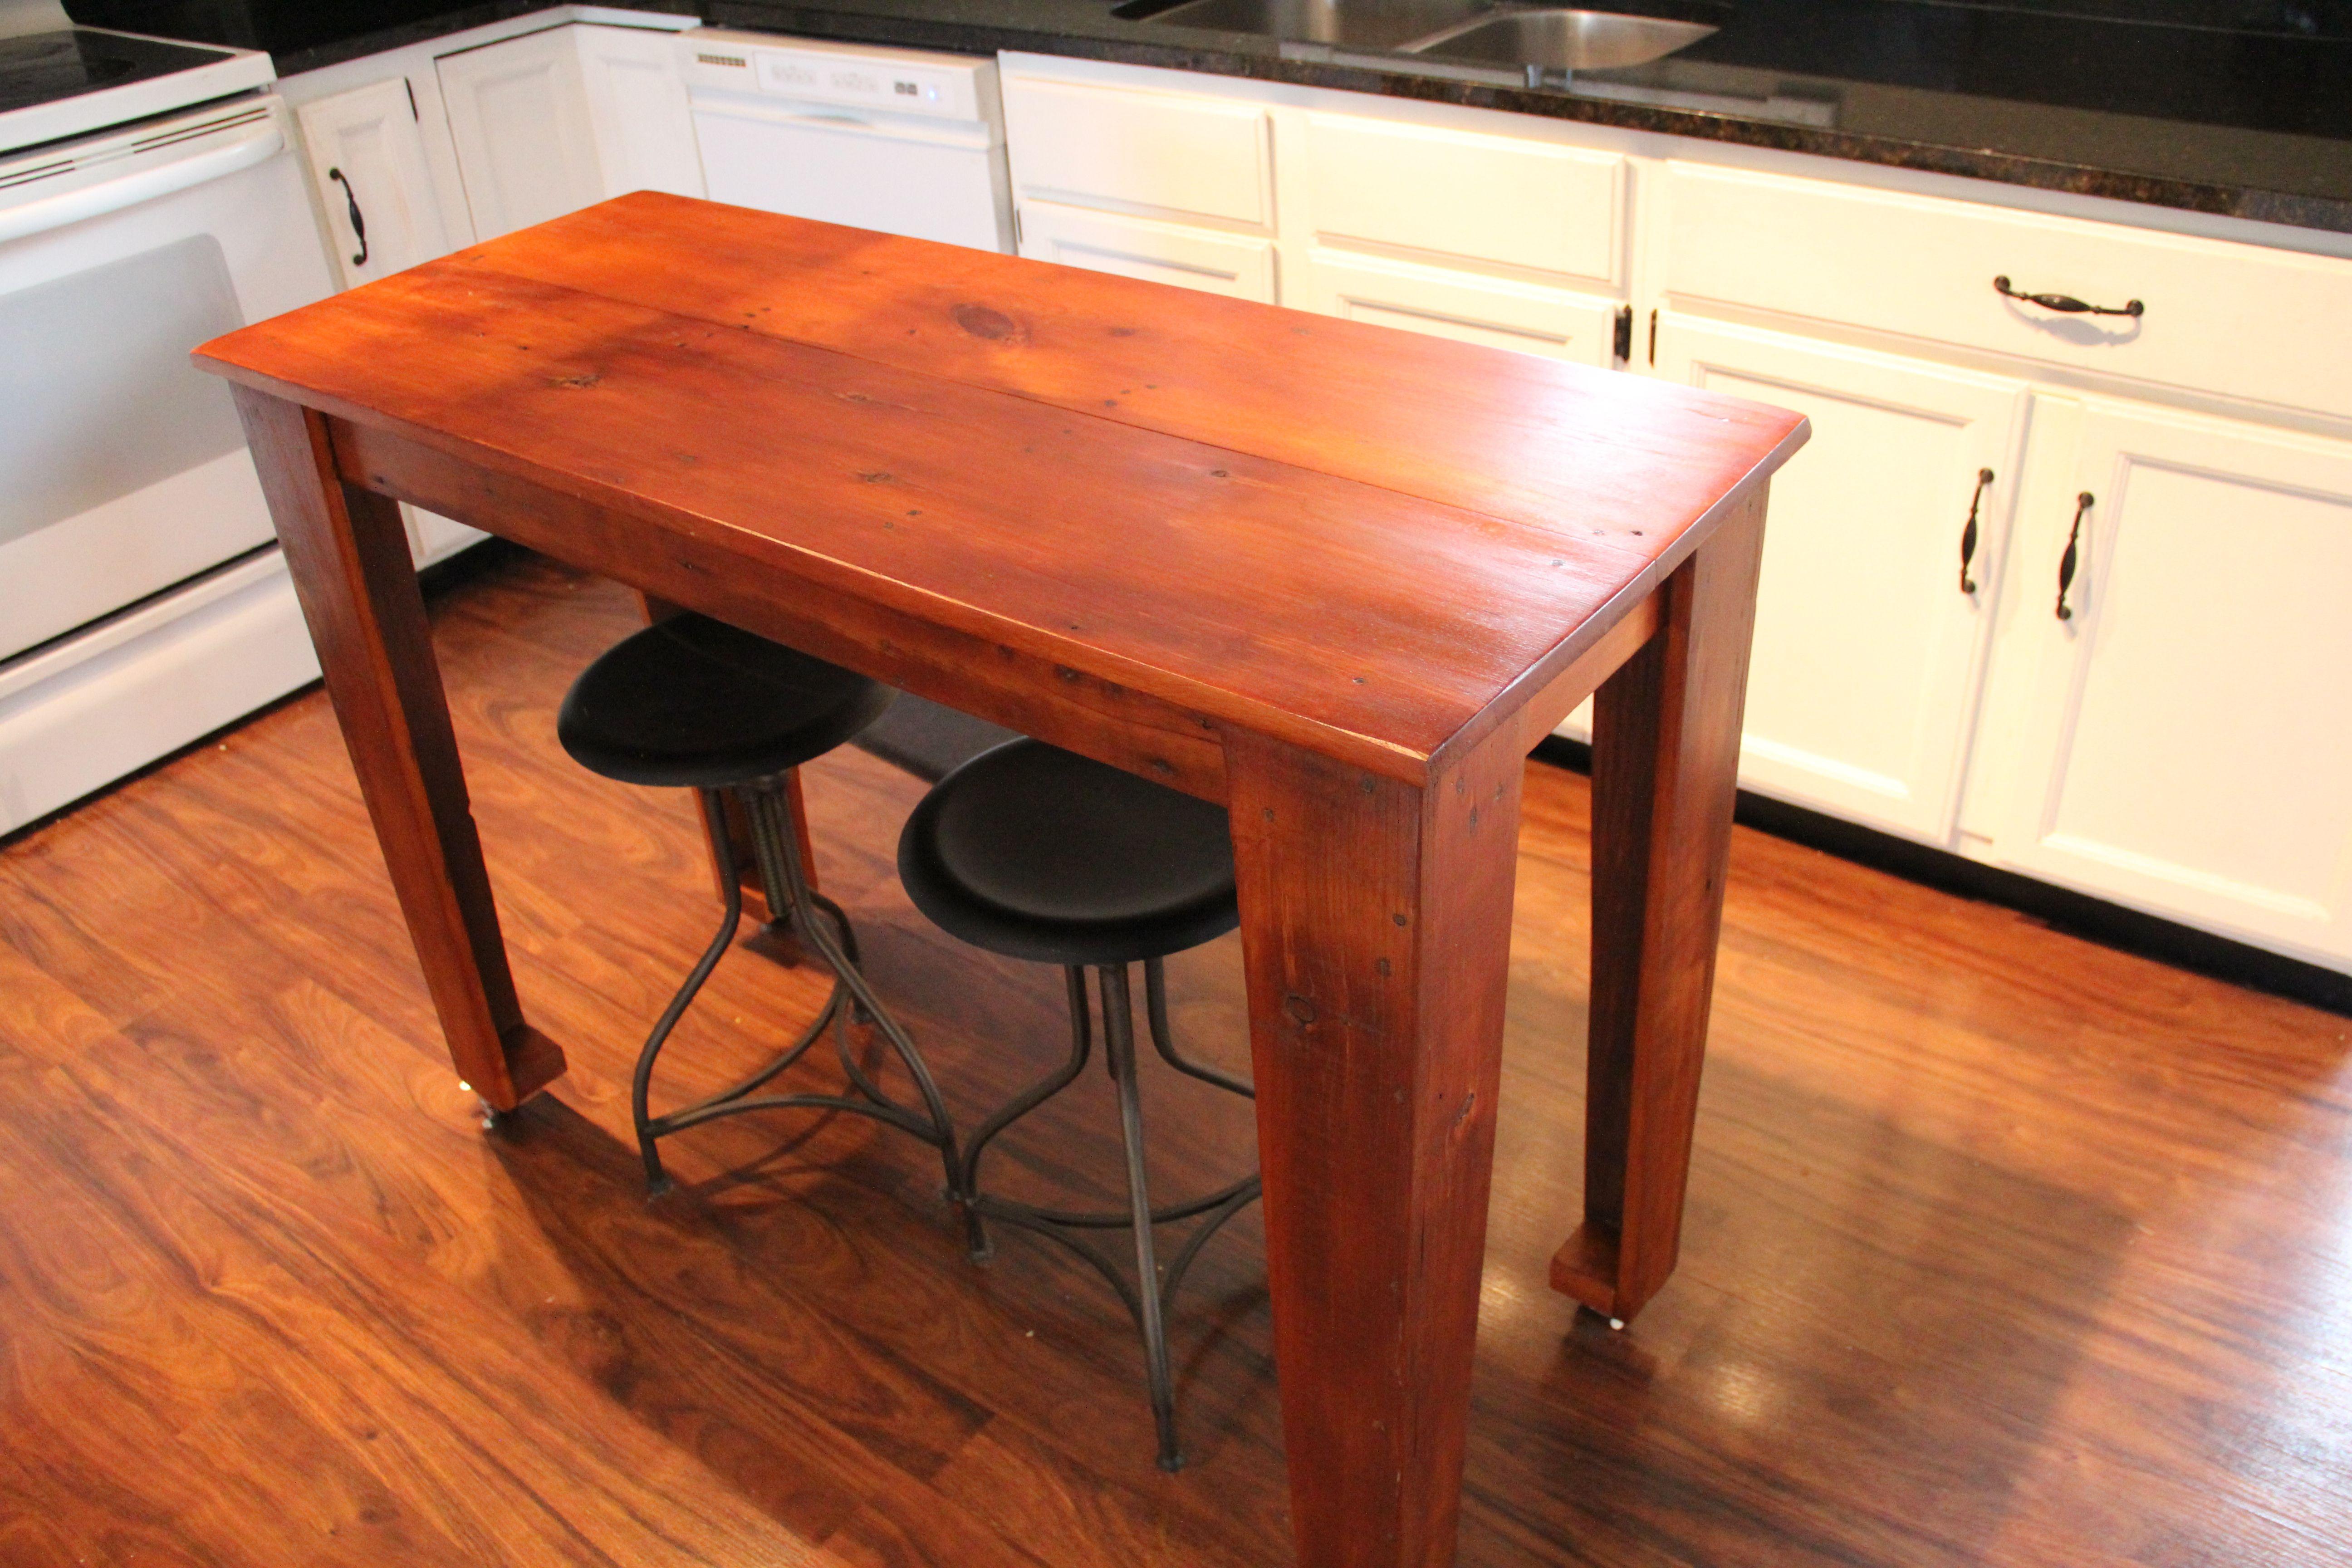 Img 7177 1 Jpg 5 184 3 456 Pixels Kitchen Prep Table Prep